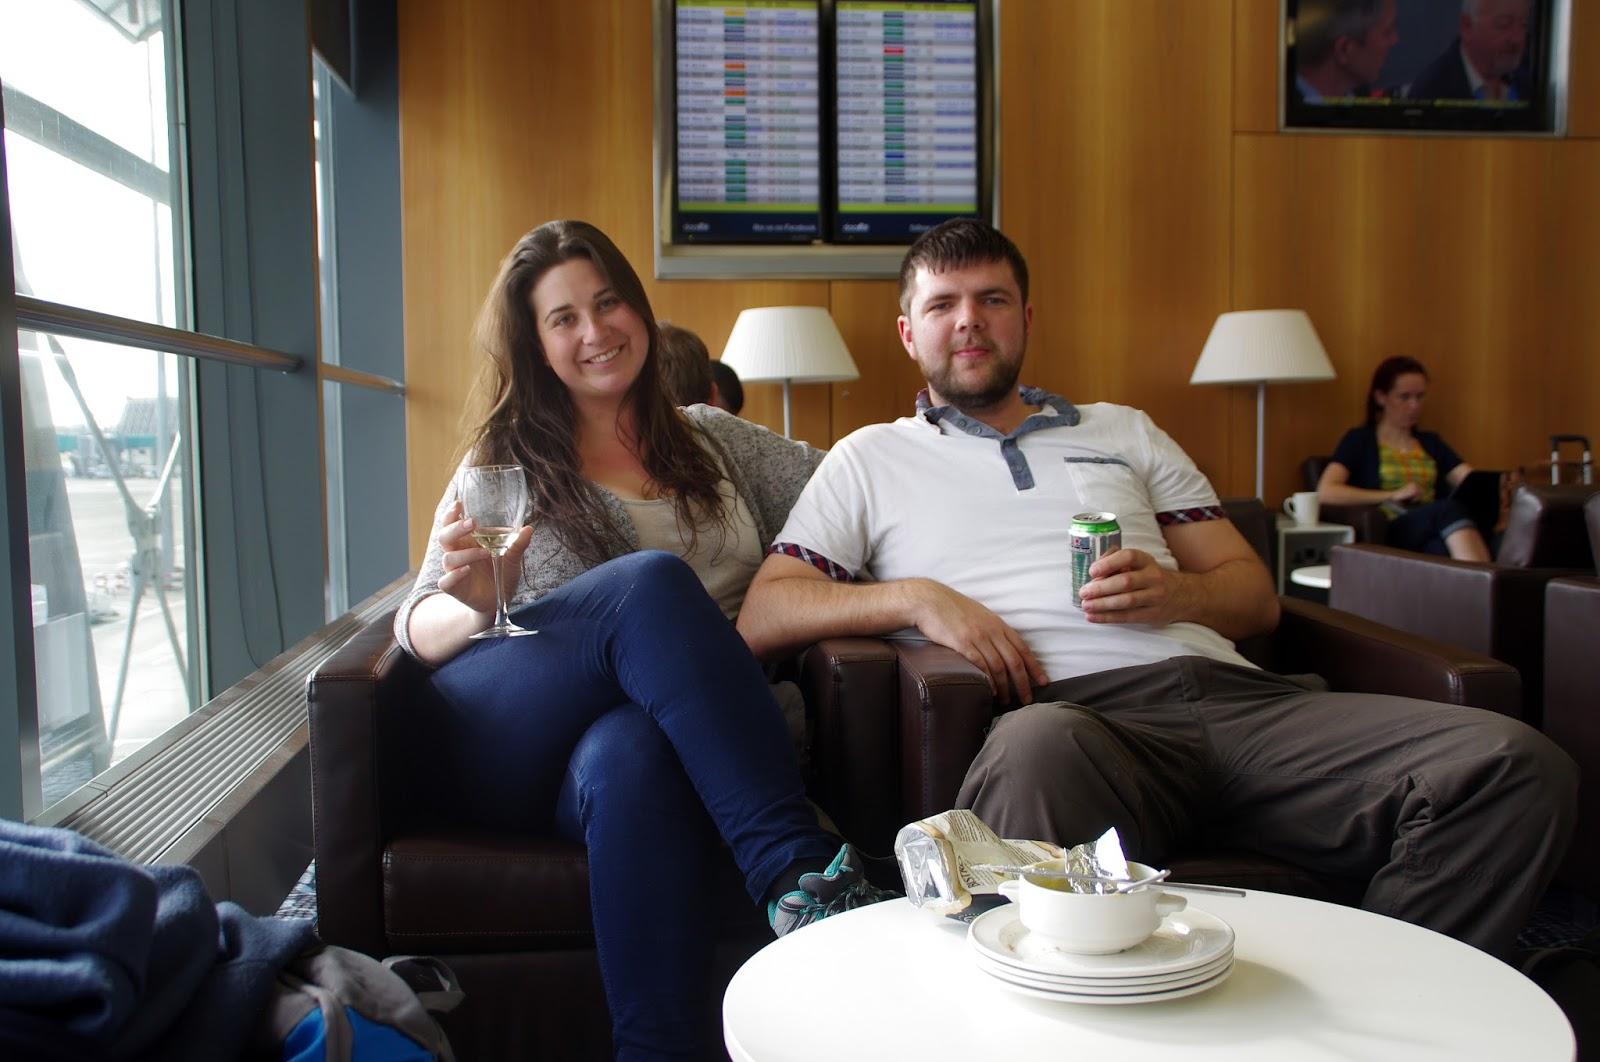 DAA Executive Lounge – Dublin Airport